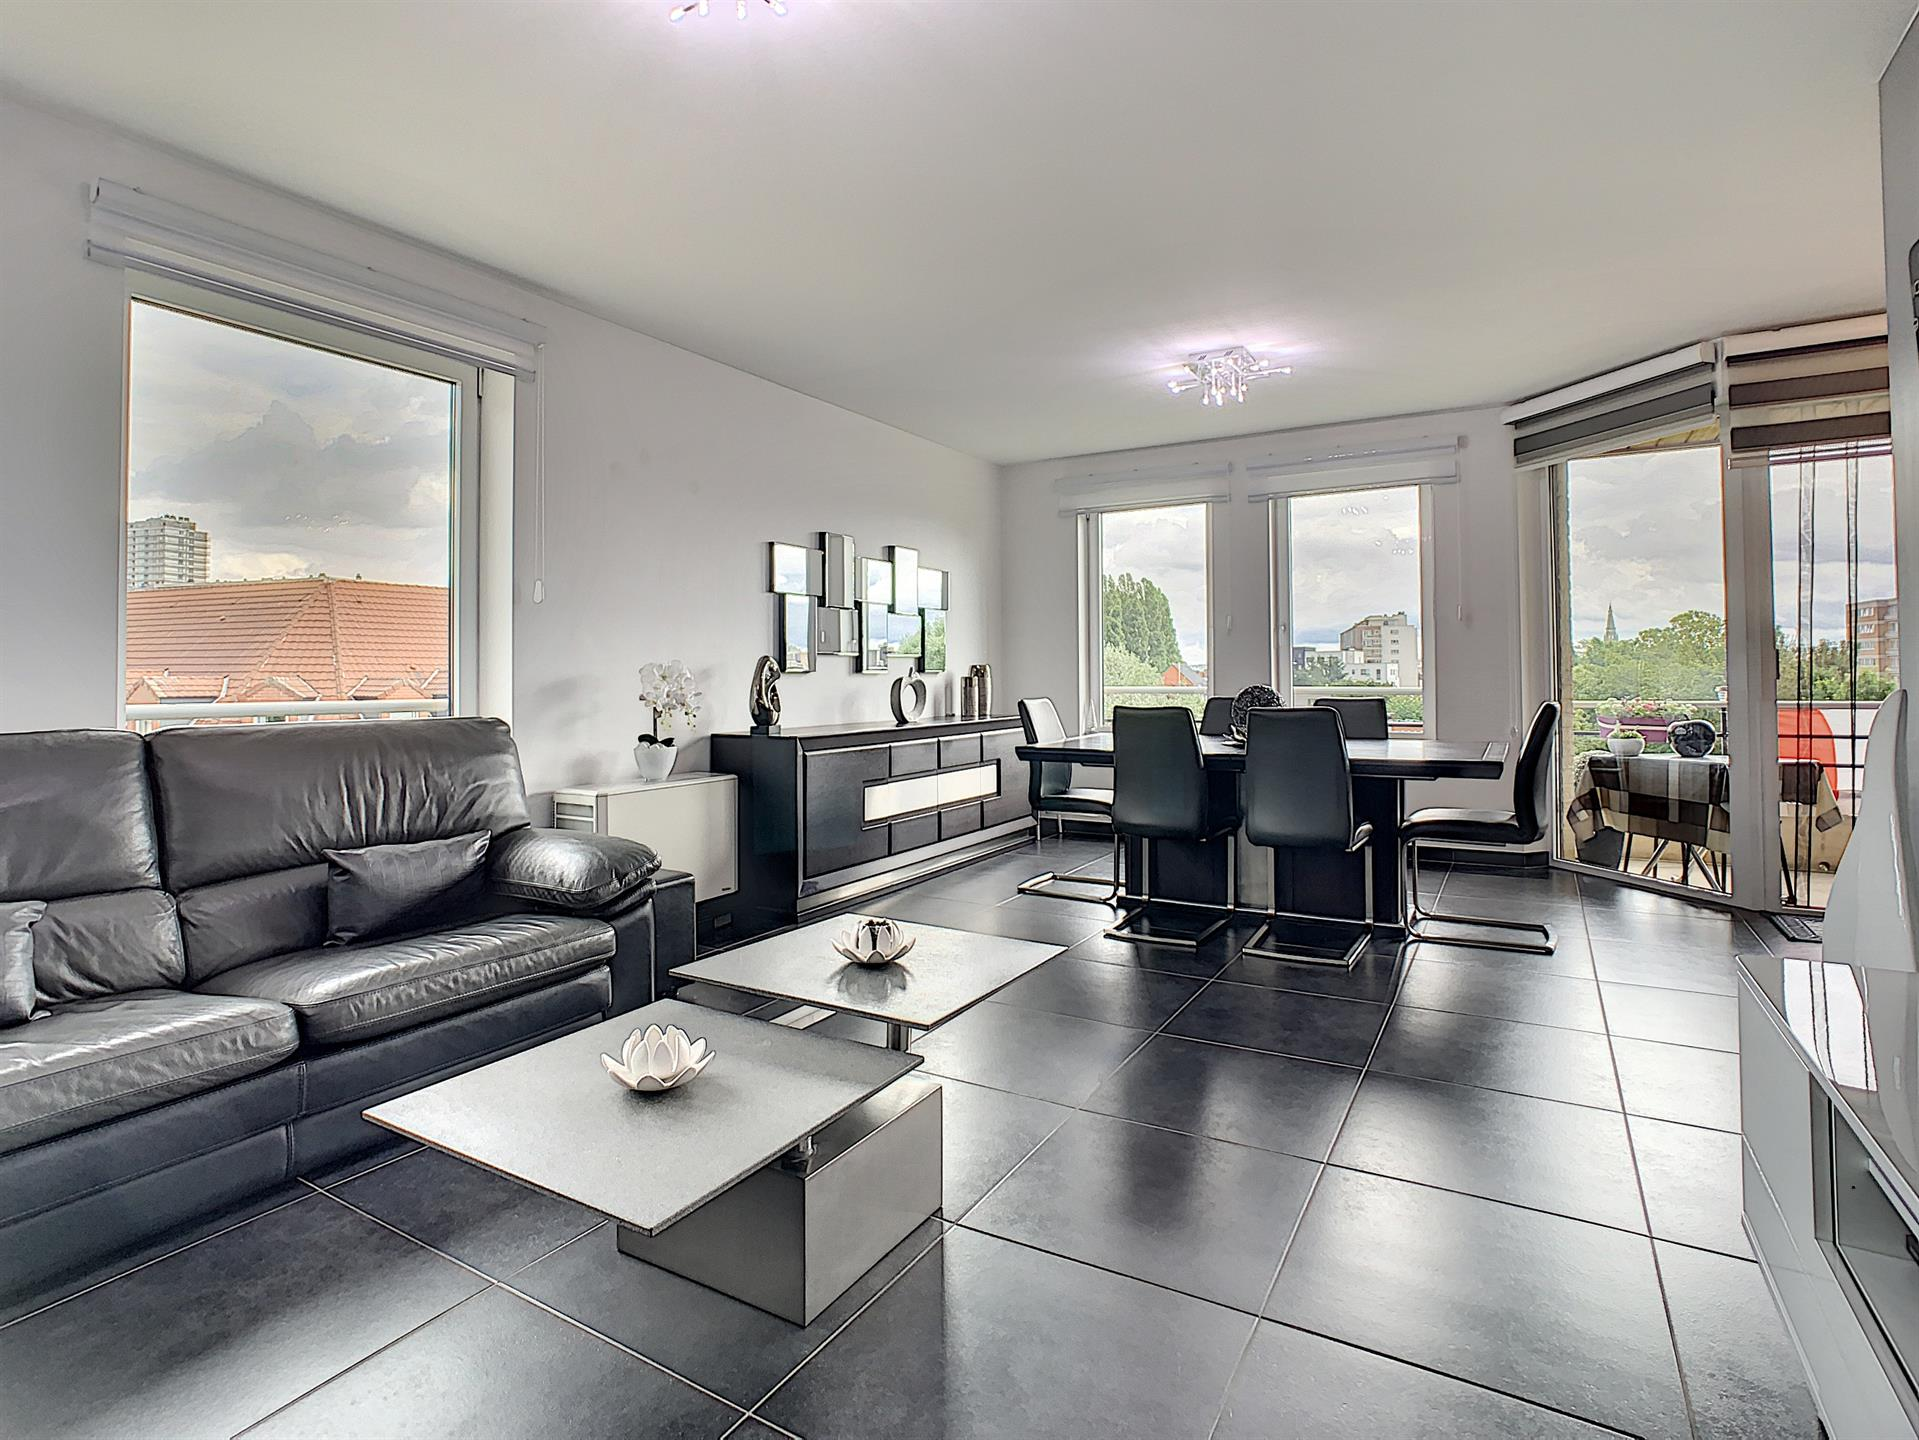 Appartement - Anderlecht - #4406224-1